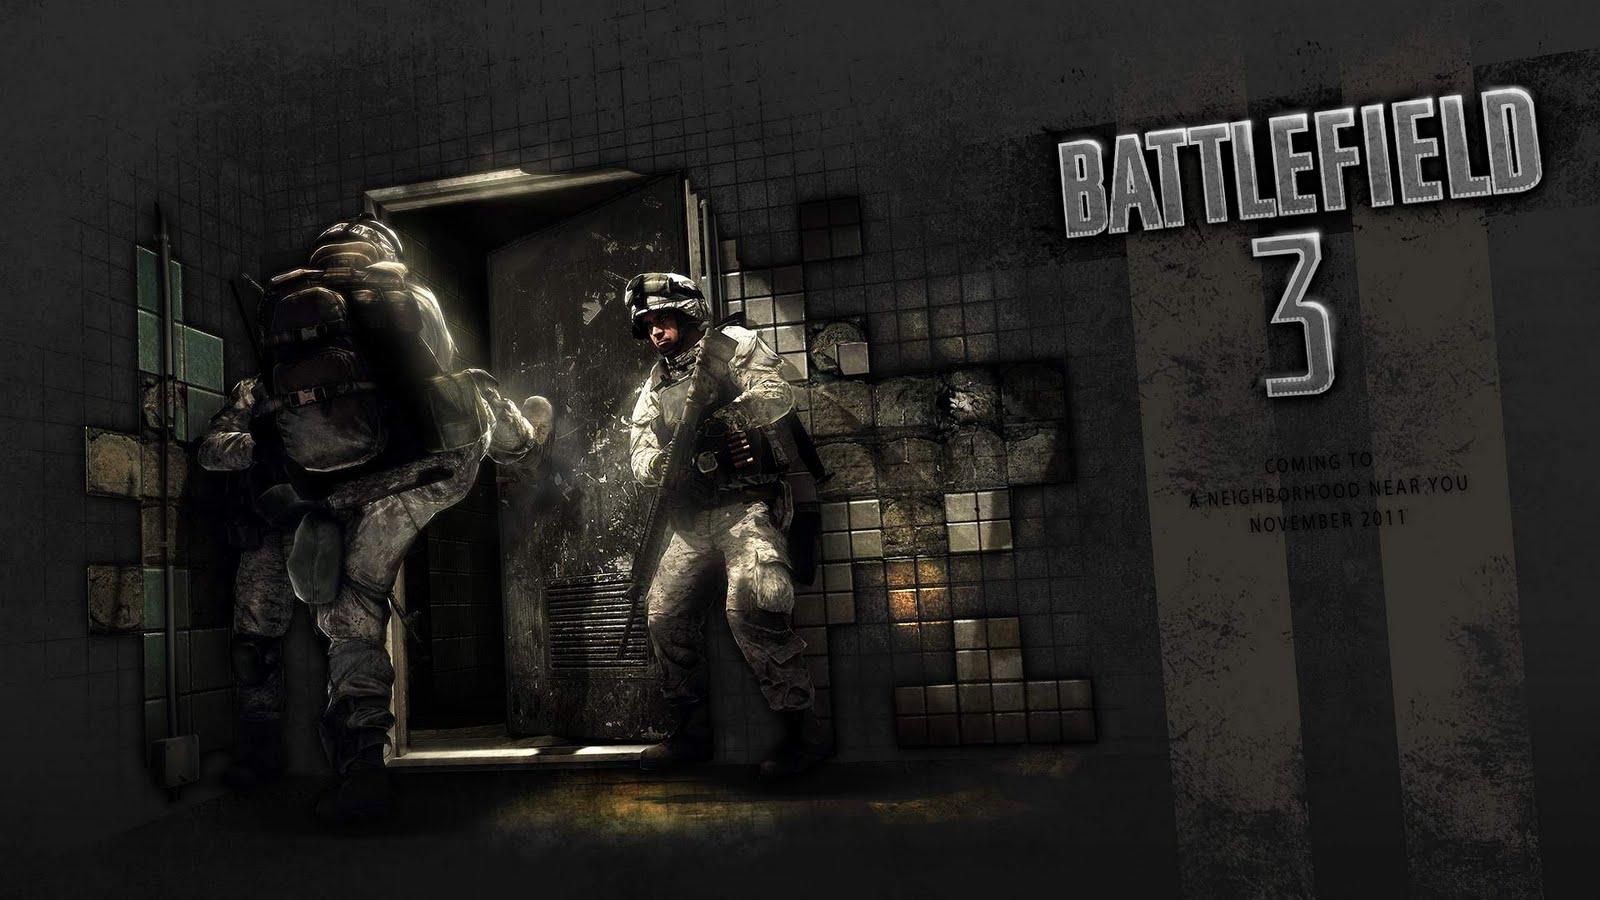 http://1.bp.blogspot.com/-Qr9-8G4k_4g/TeeUYNywVGI/AAAAAAAAAFA/CApl4WuqCzg/s1600/Battlefield+3+Wallpapers-15.jpg